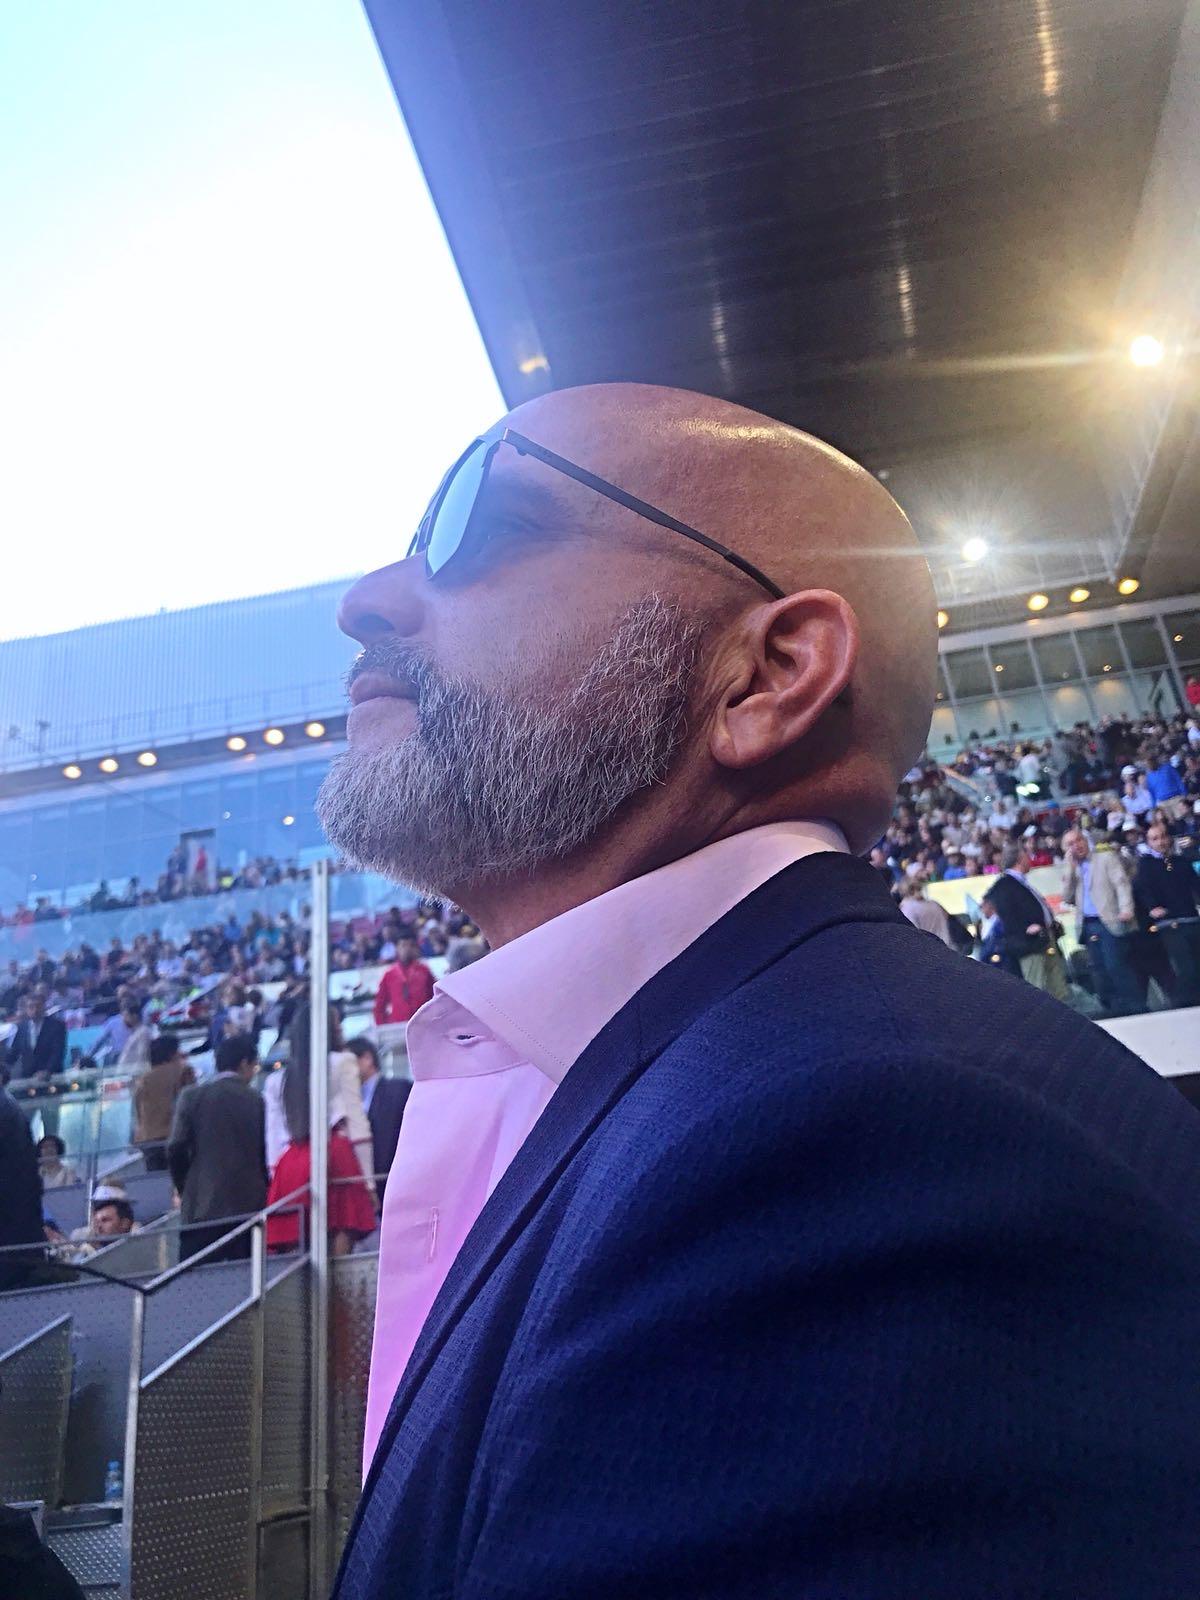 Gustavo Mirabal finanzas, caballos, derecho